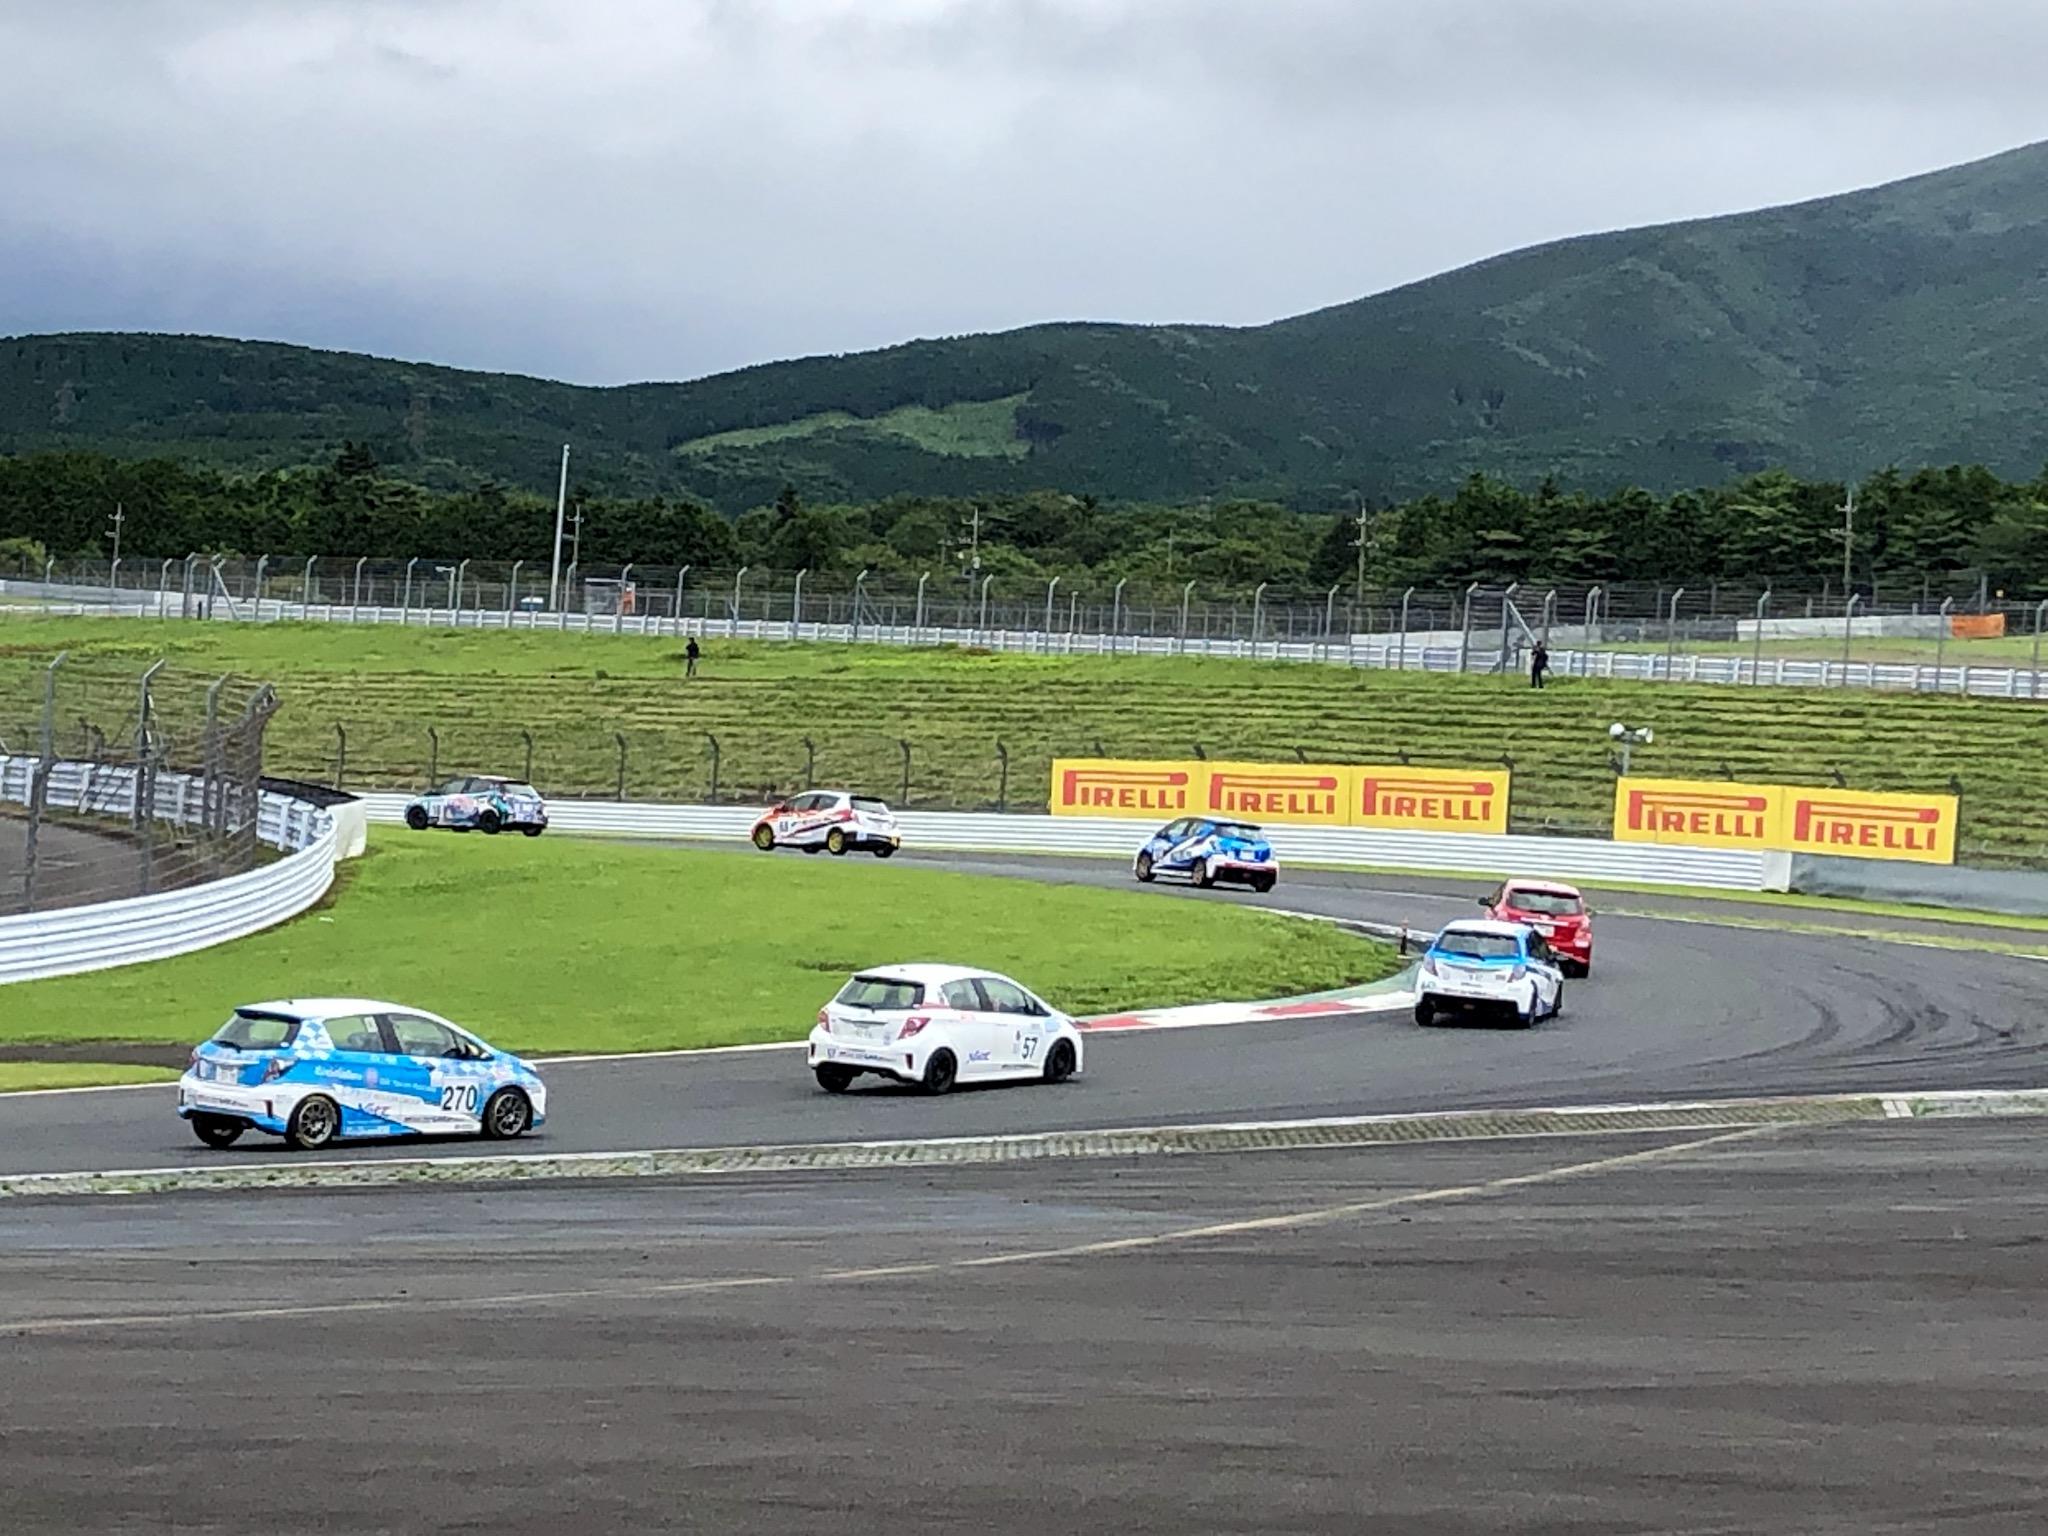 Netz Cup Vitz Race(ヴィッツ・レース)270番車 清水宏保選手